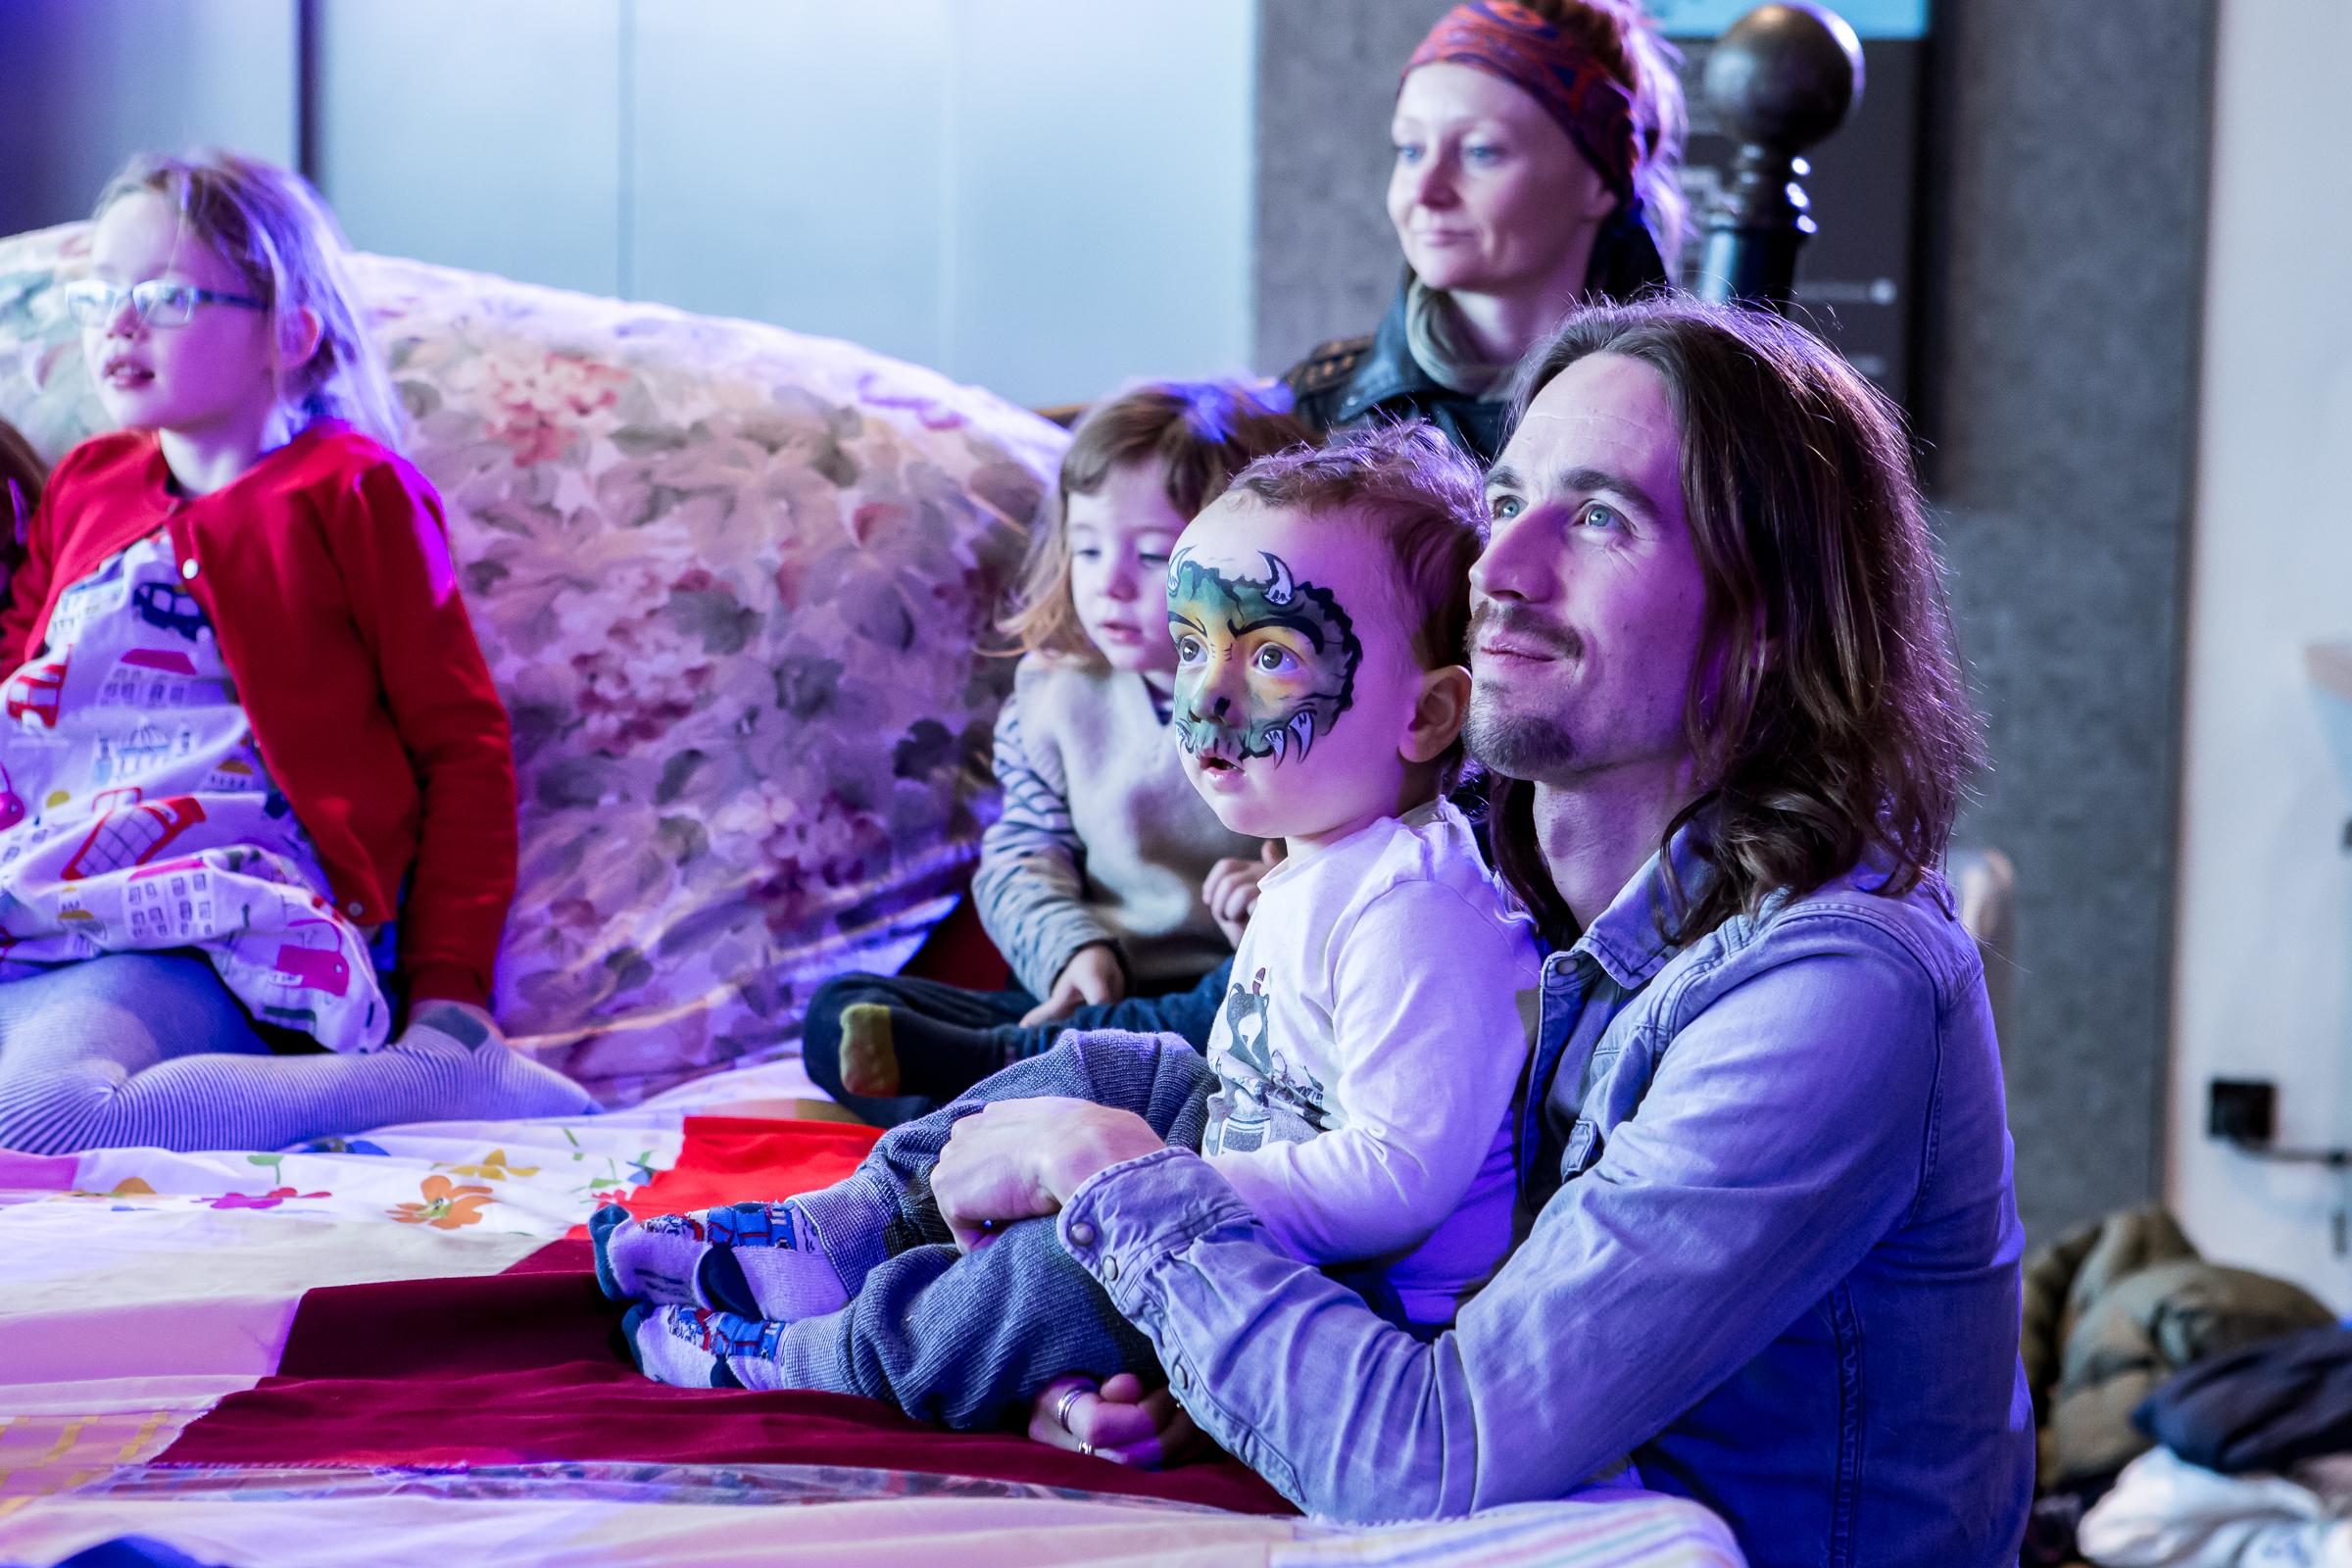 THE GIANT STORYTELLING BED at Imagine Children's Festival Credit Victor Frankowski 2016